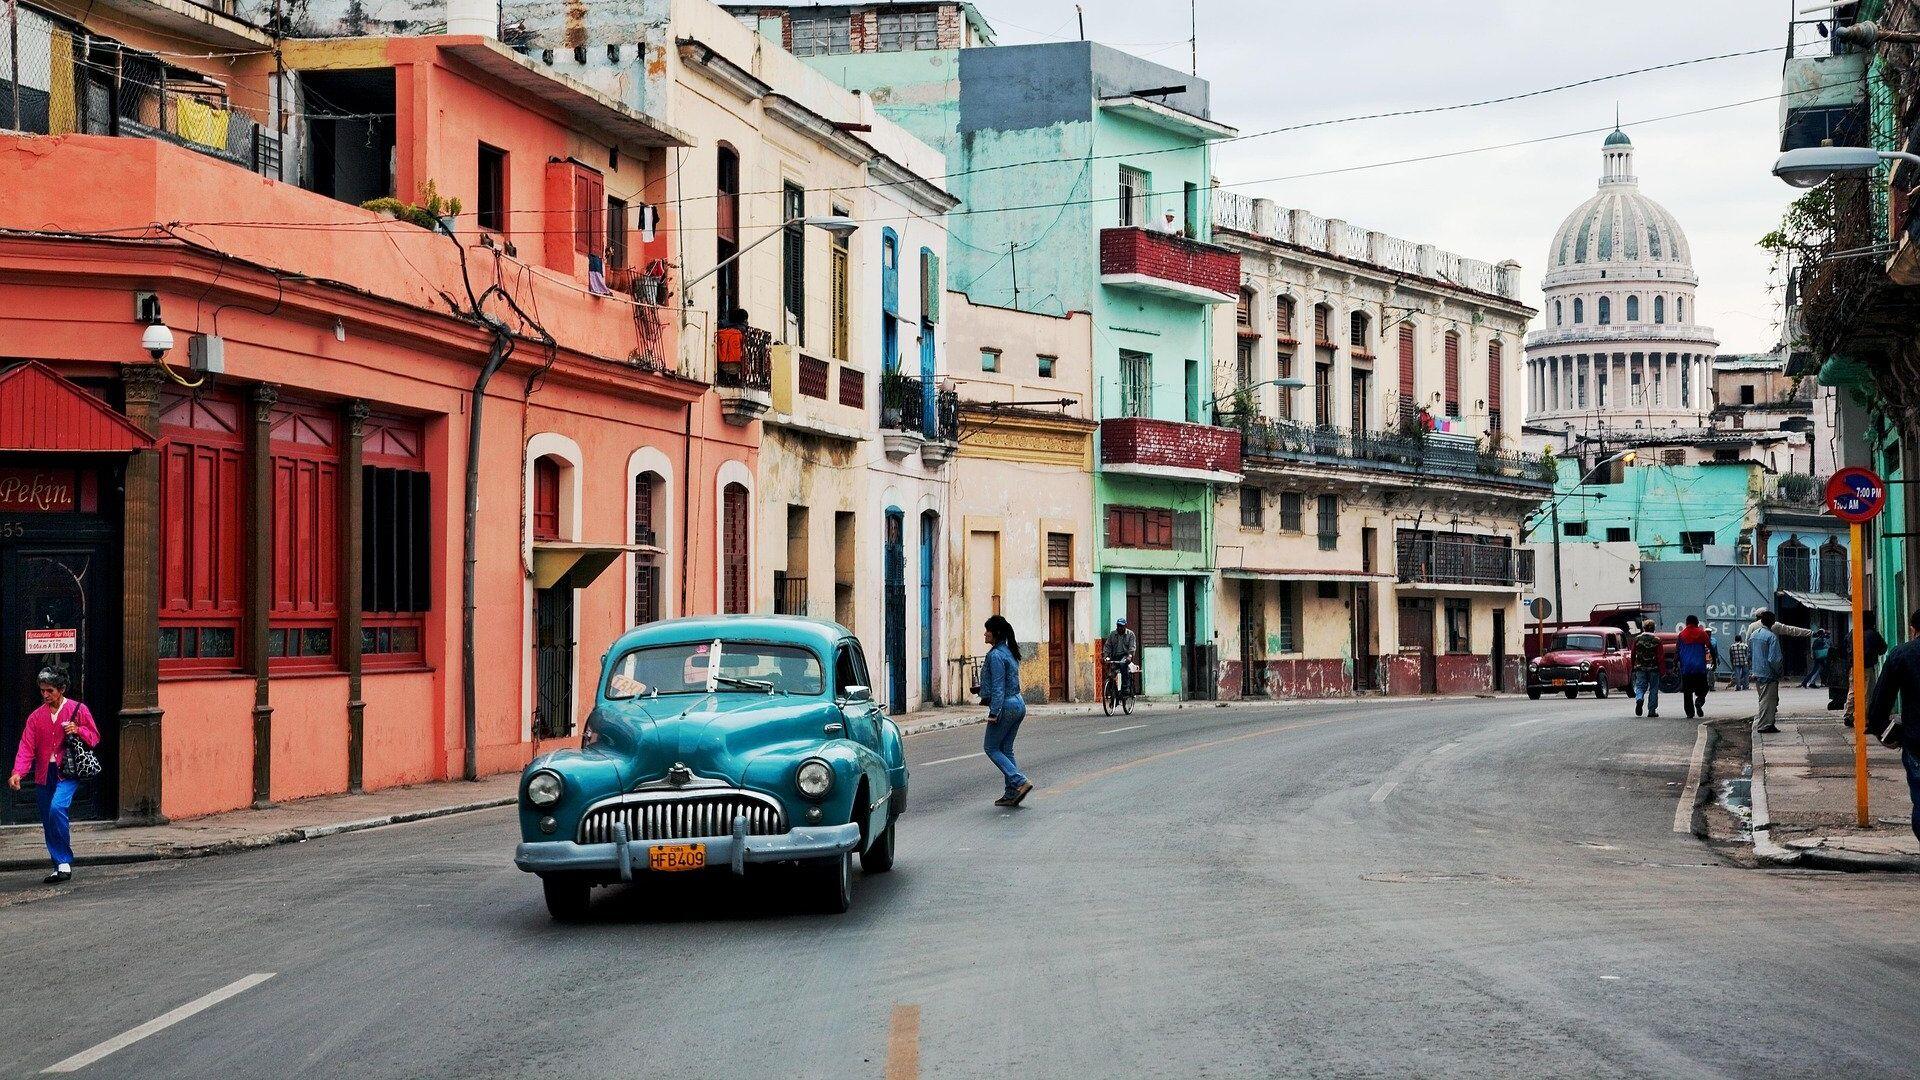 La Habana, capital de Cuba - Sputnik Mundo, 1920, 13.05.2021